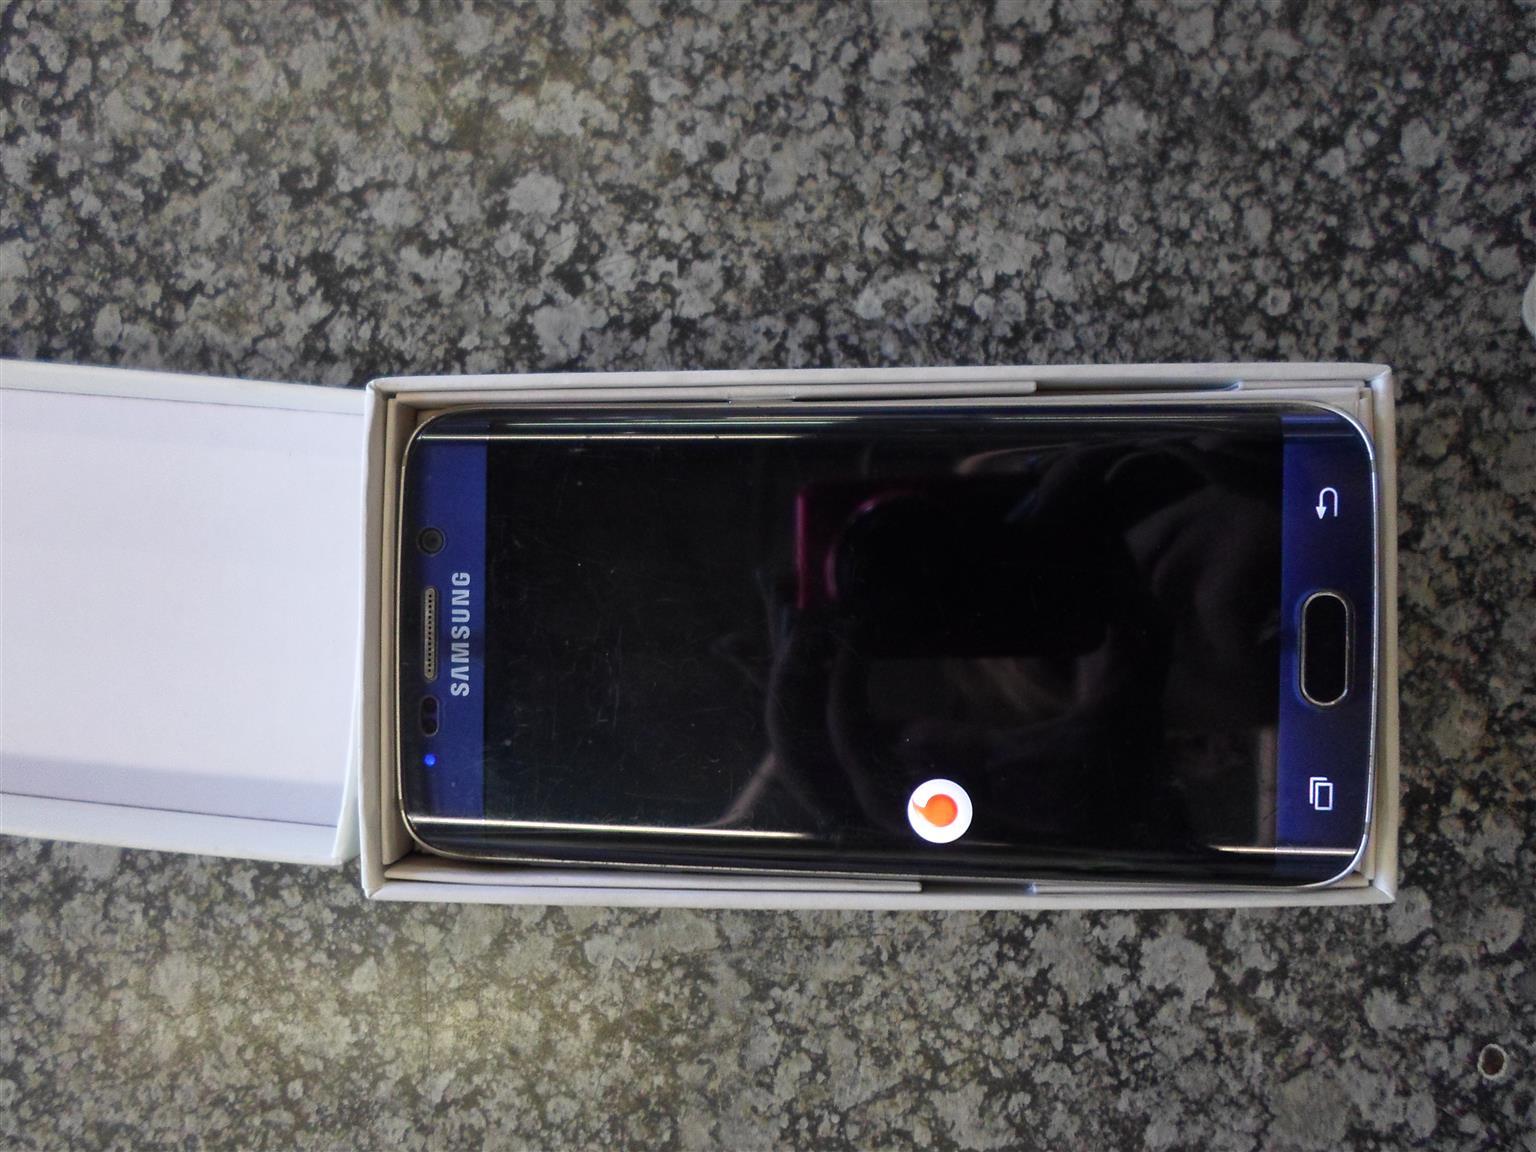 64GB Samsung S6 Edge